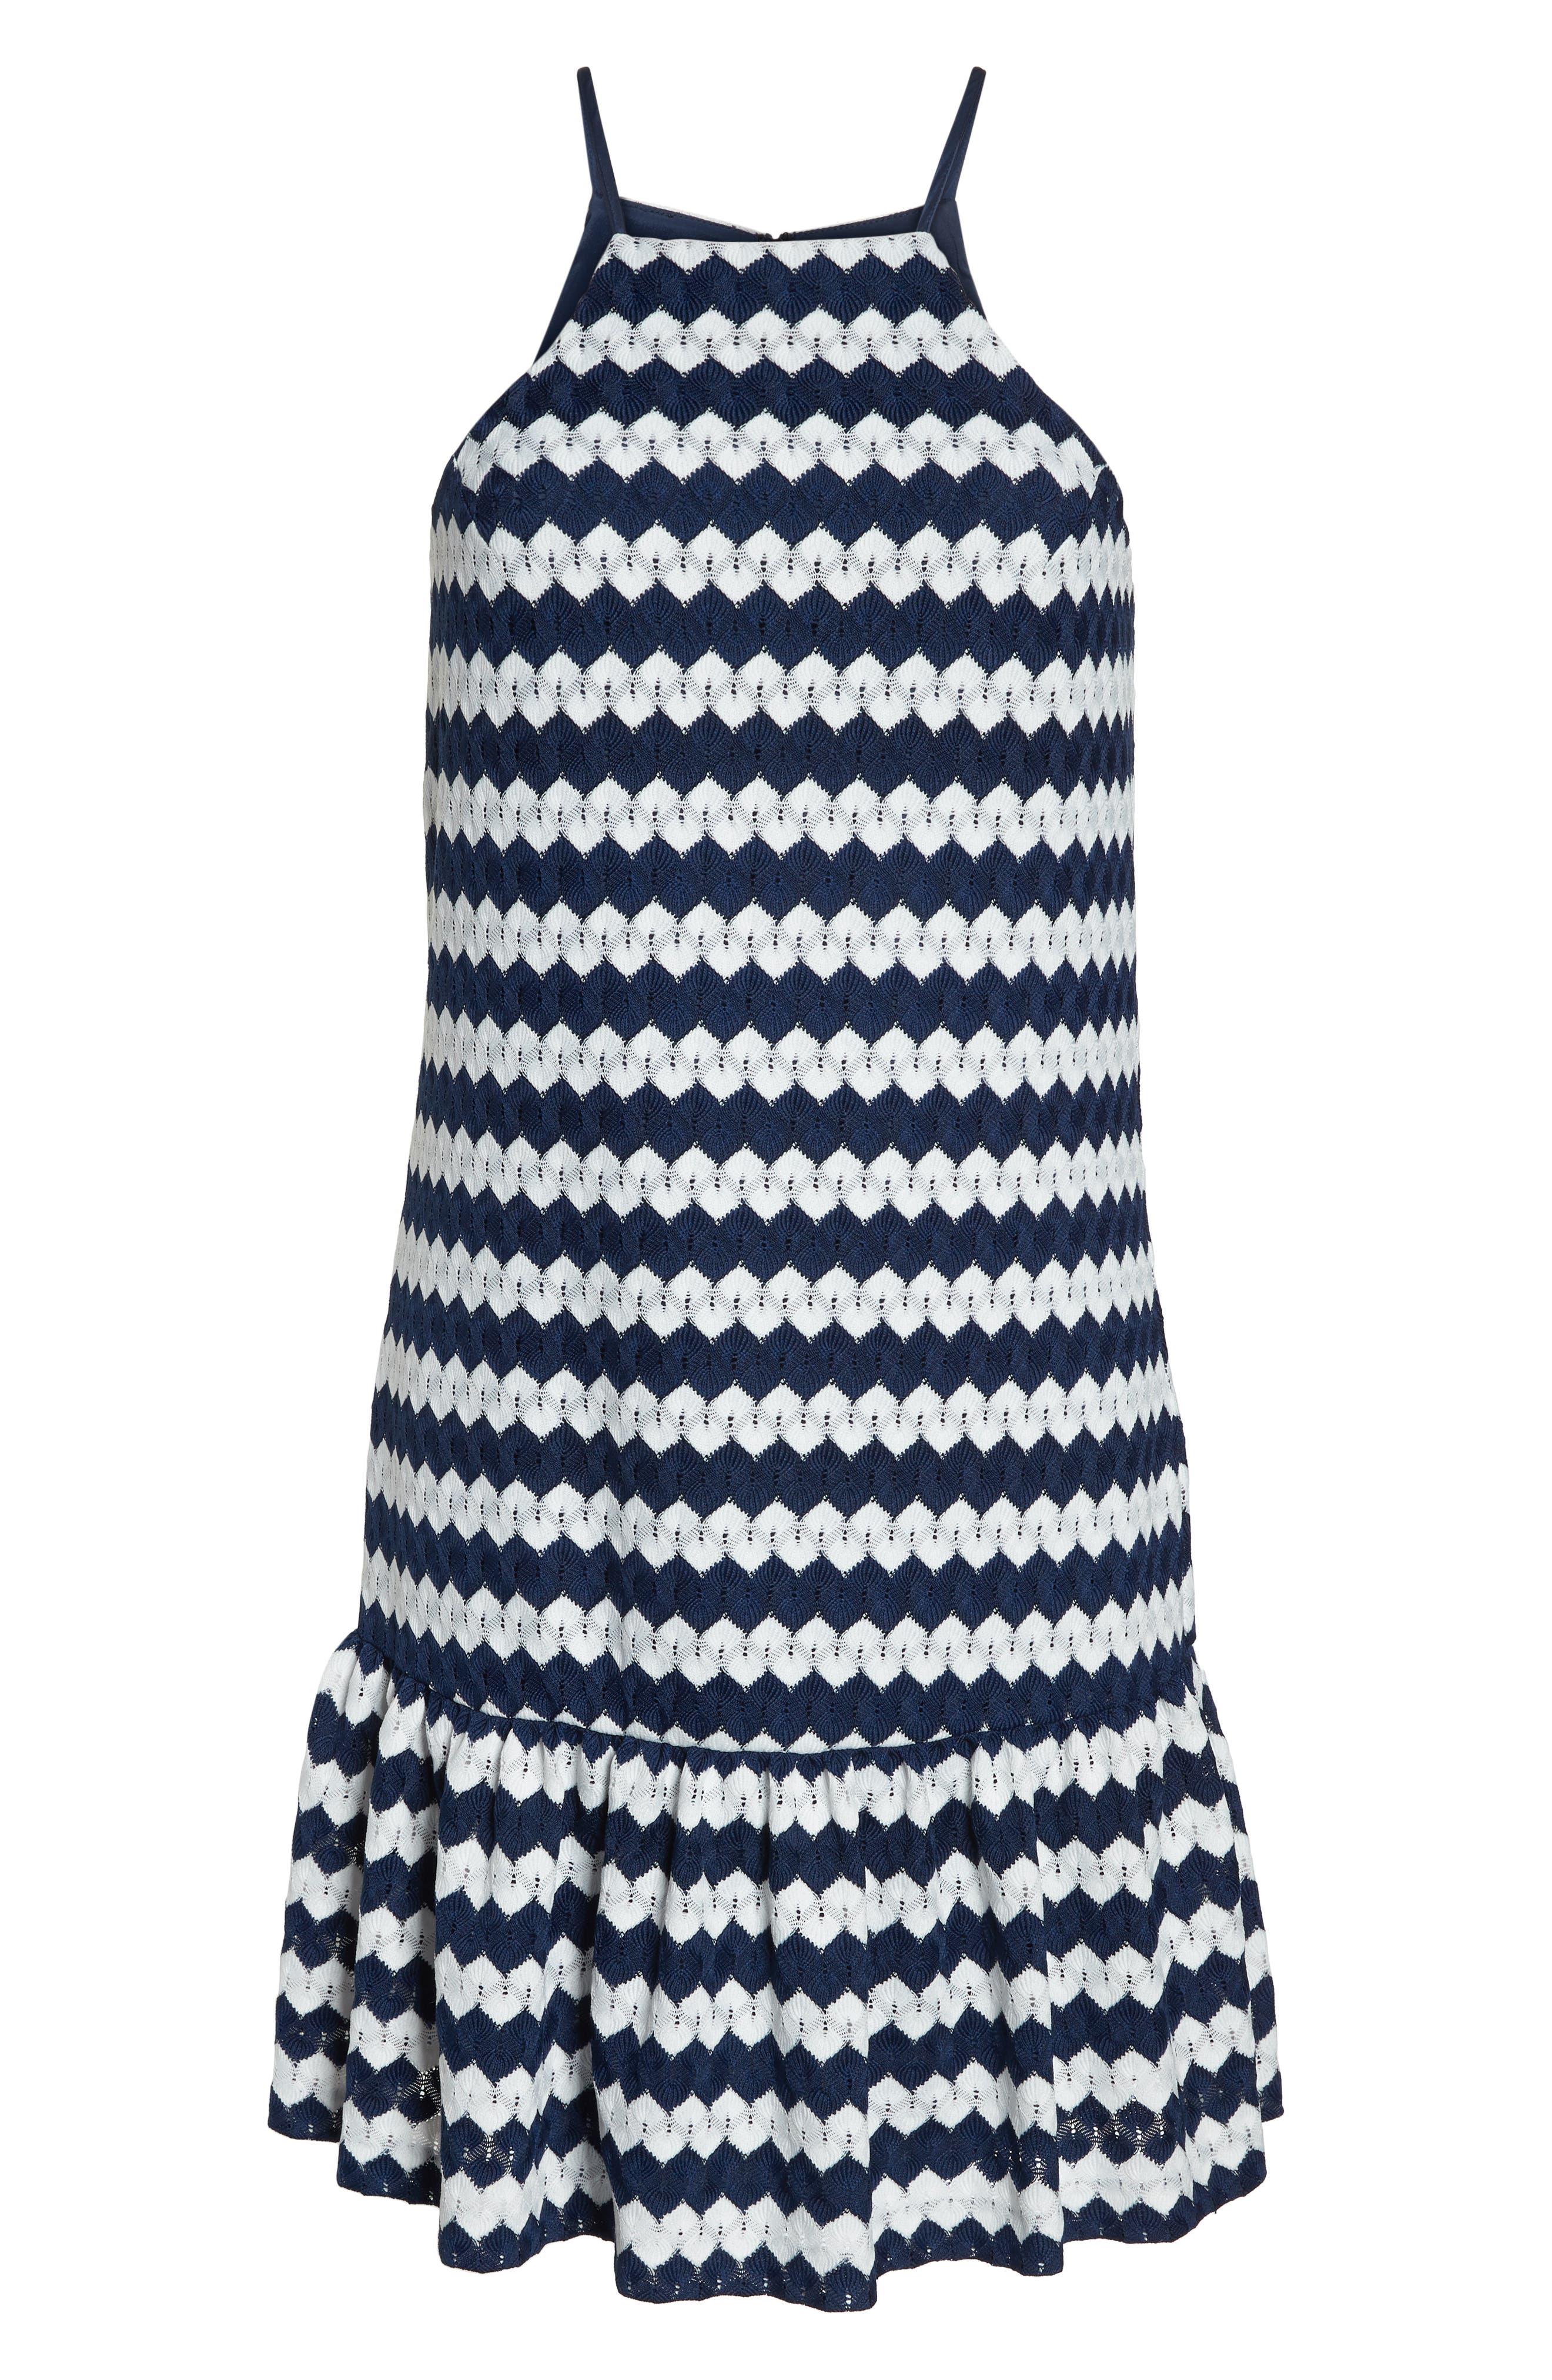 Zigzag Halter Shift Dress,                             Alternate thumbnail 7, color,                             Indigo/ Whitewash